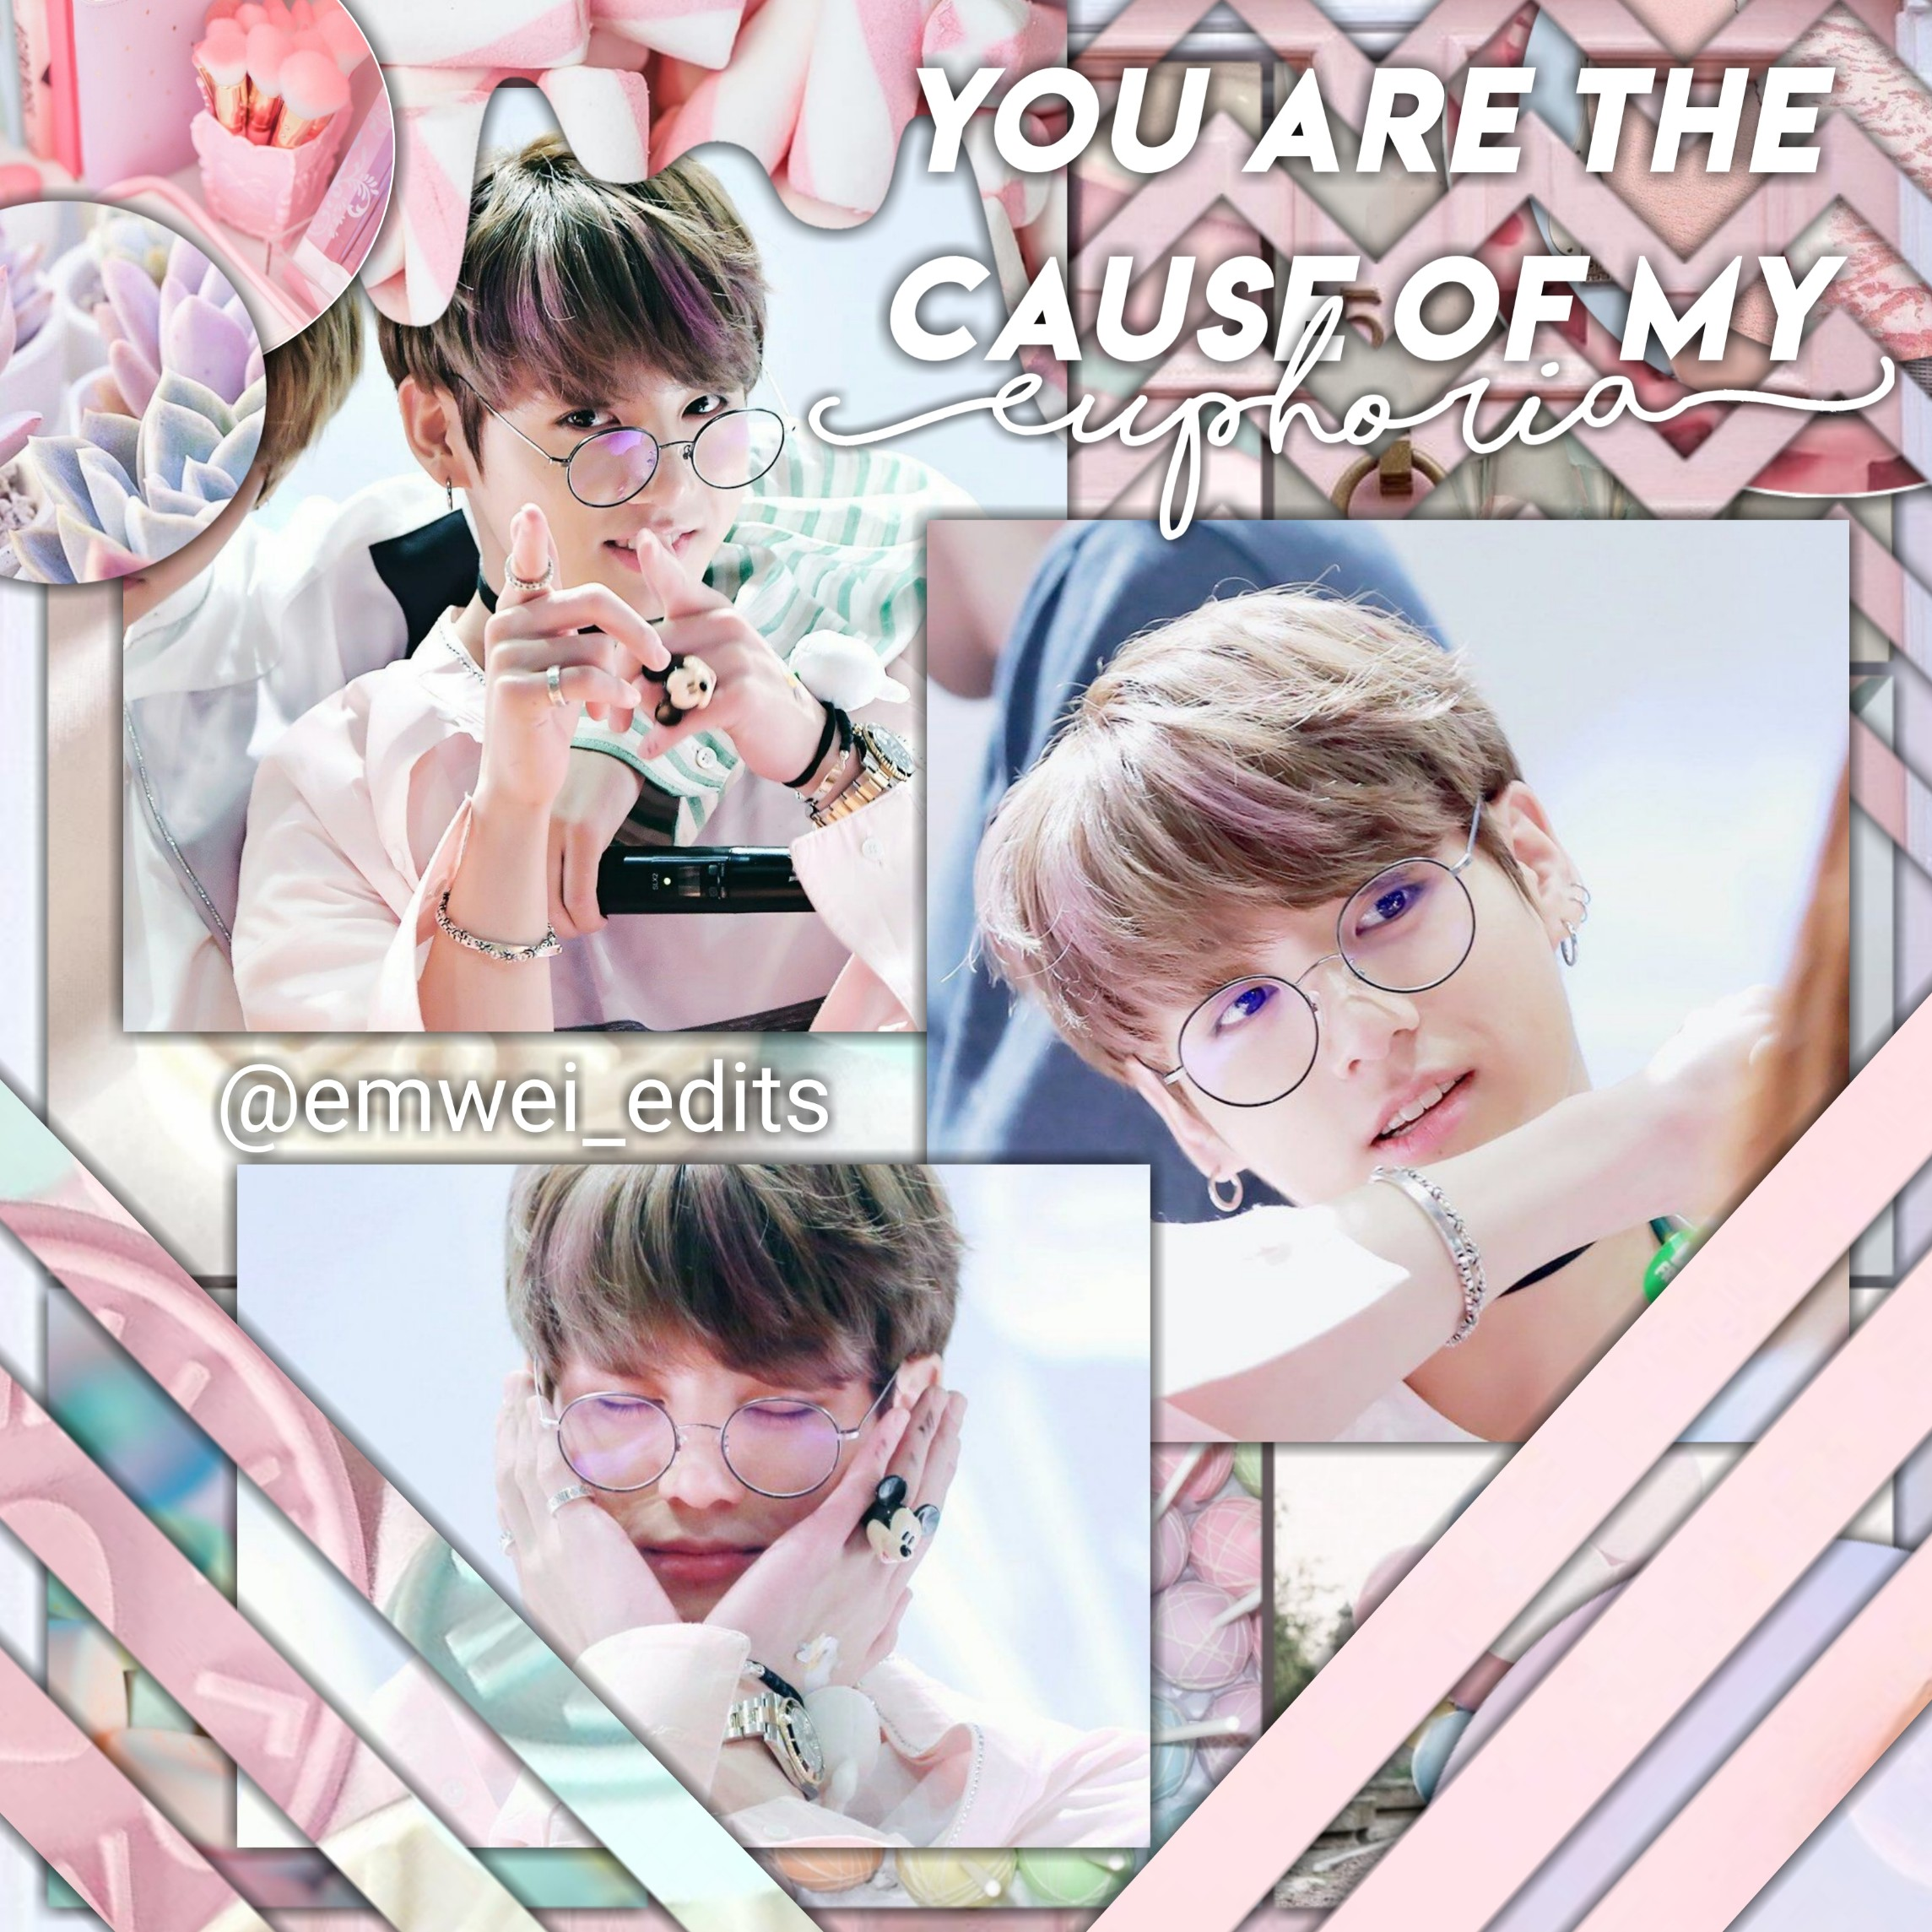 Bts Jeon Jungkook Pastel Pink Aesthetic Edit Jk